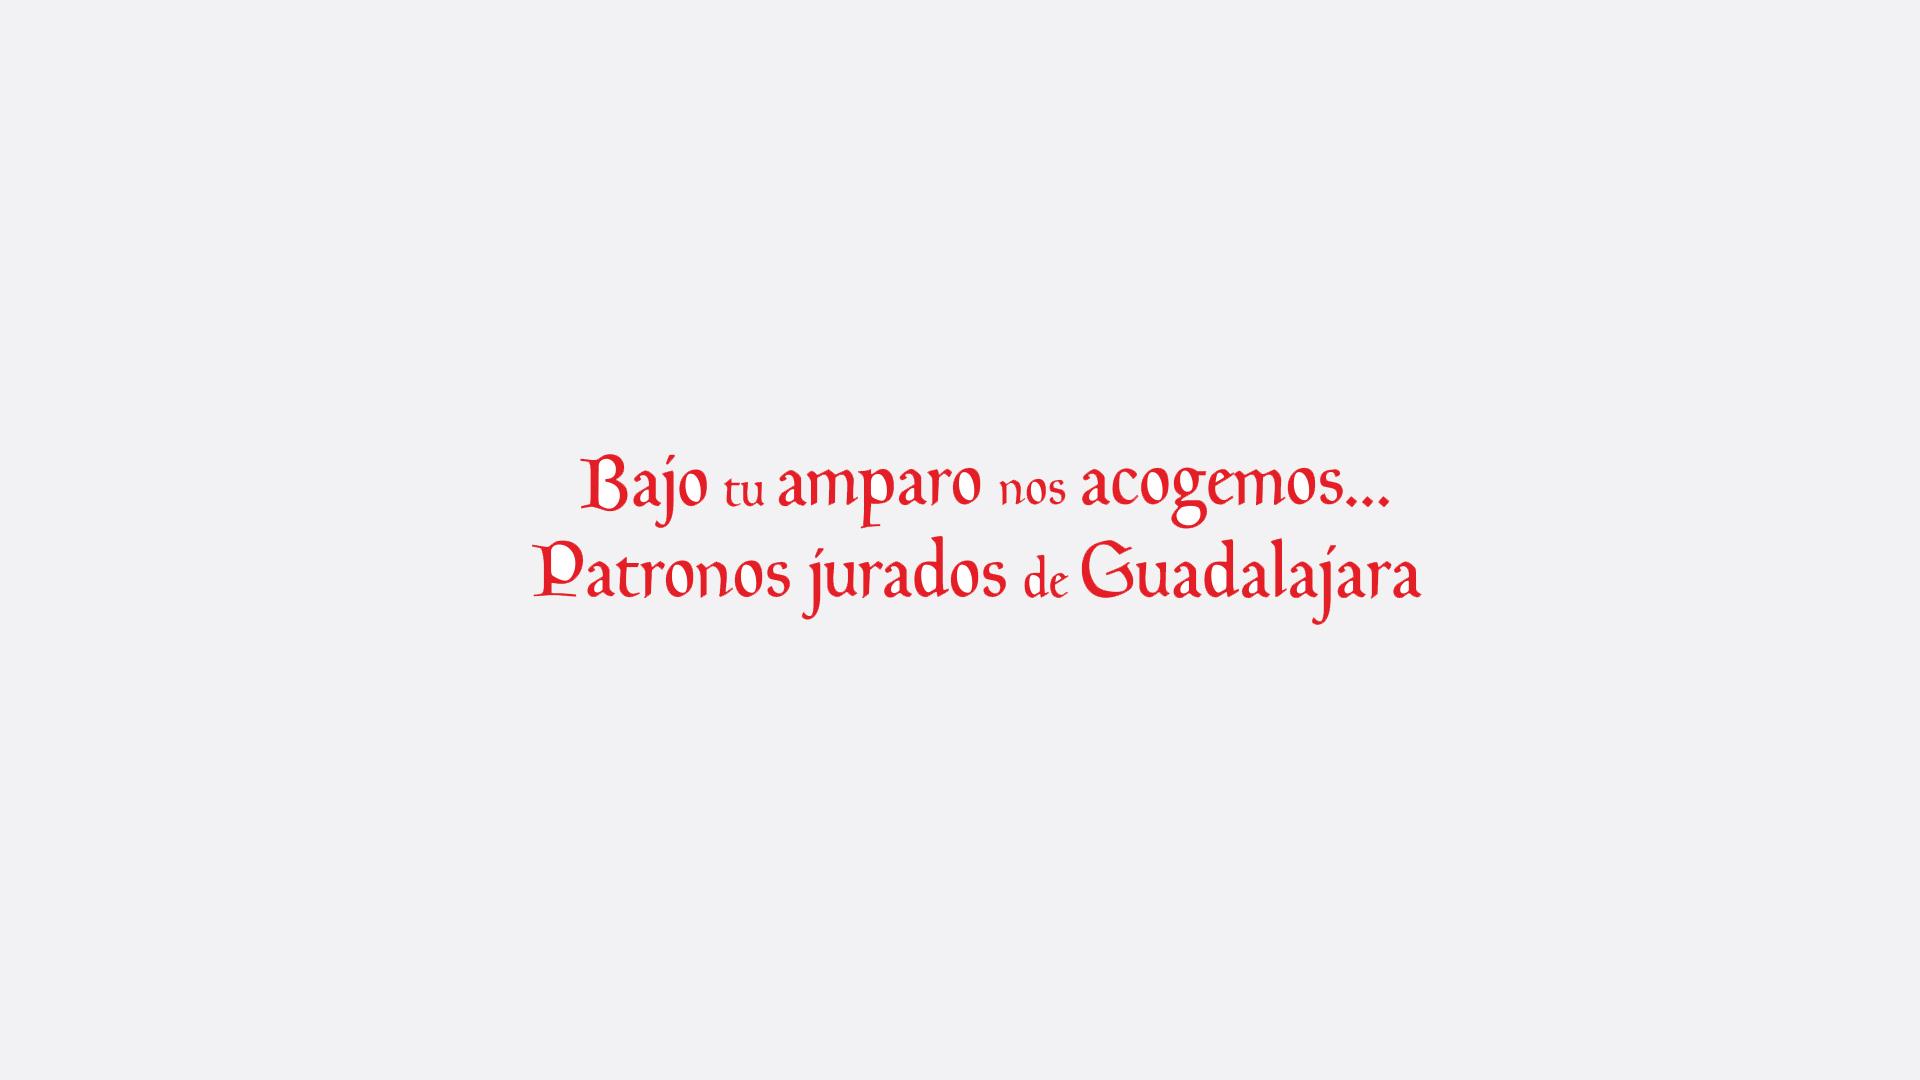 Fotos_bajotuamparo_1